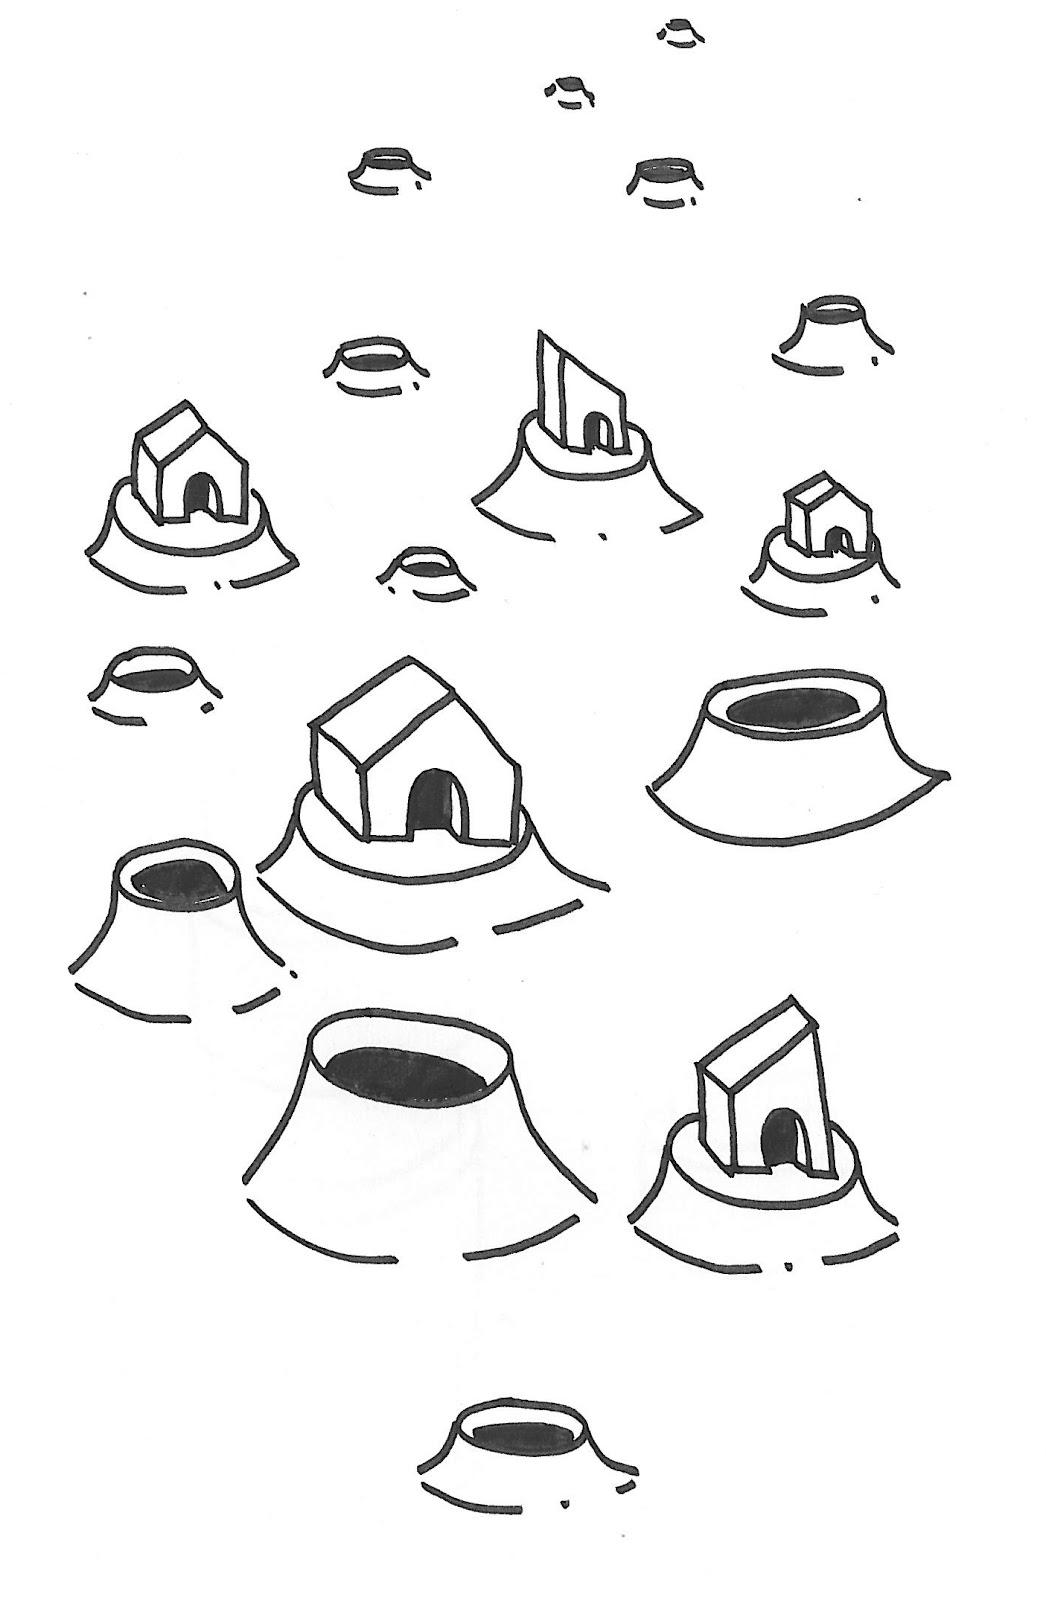 Car Parts Diagram Clip Art, Car, Free Engine Image For